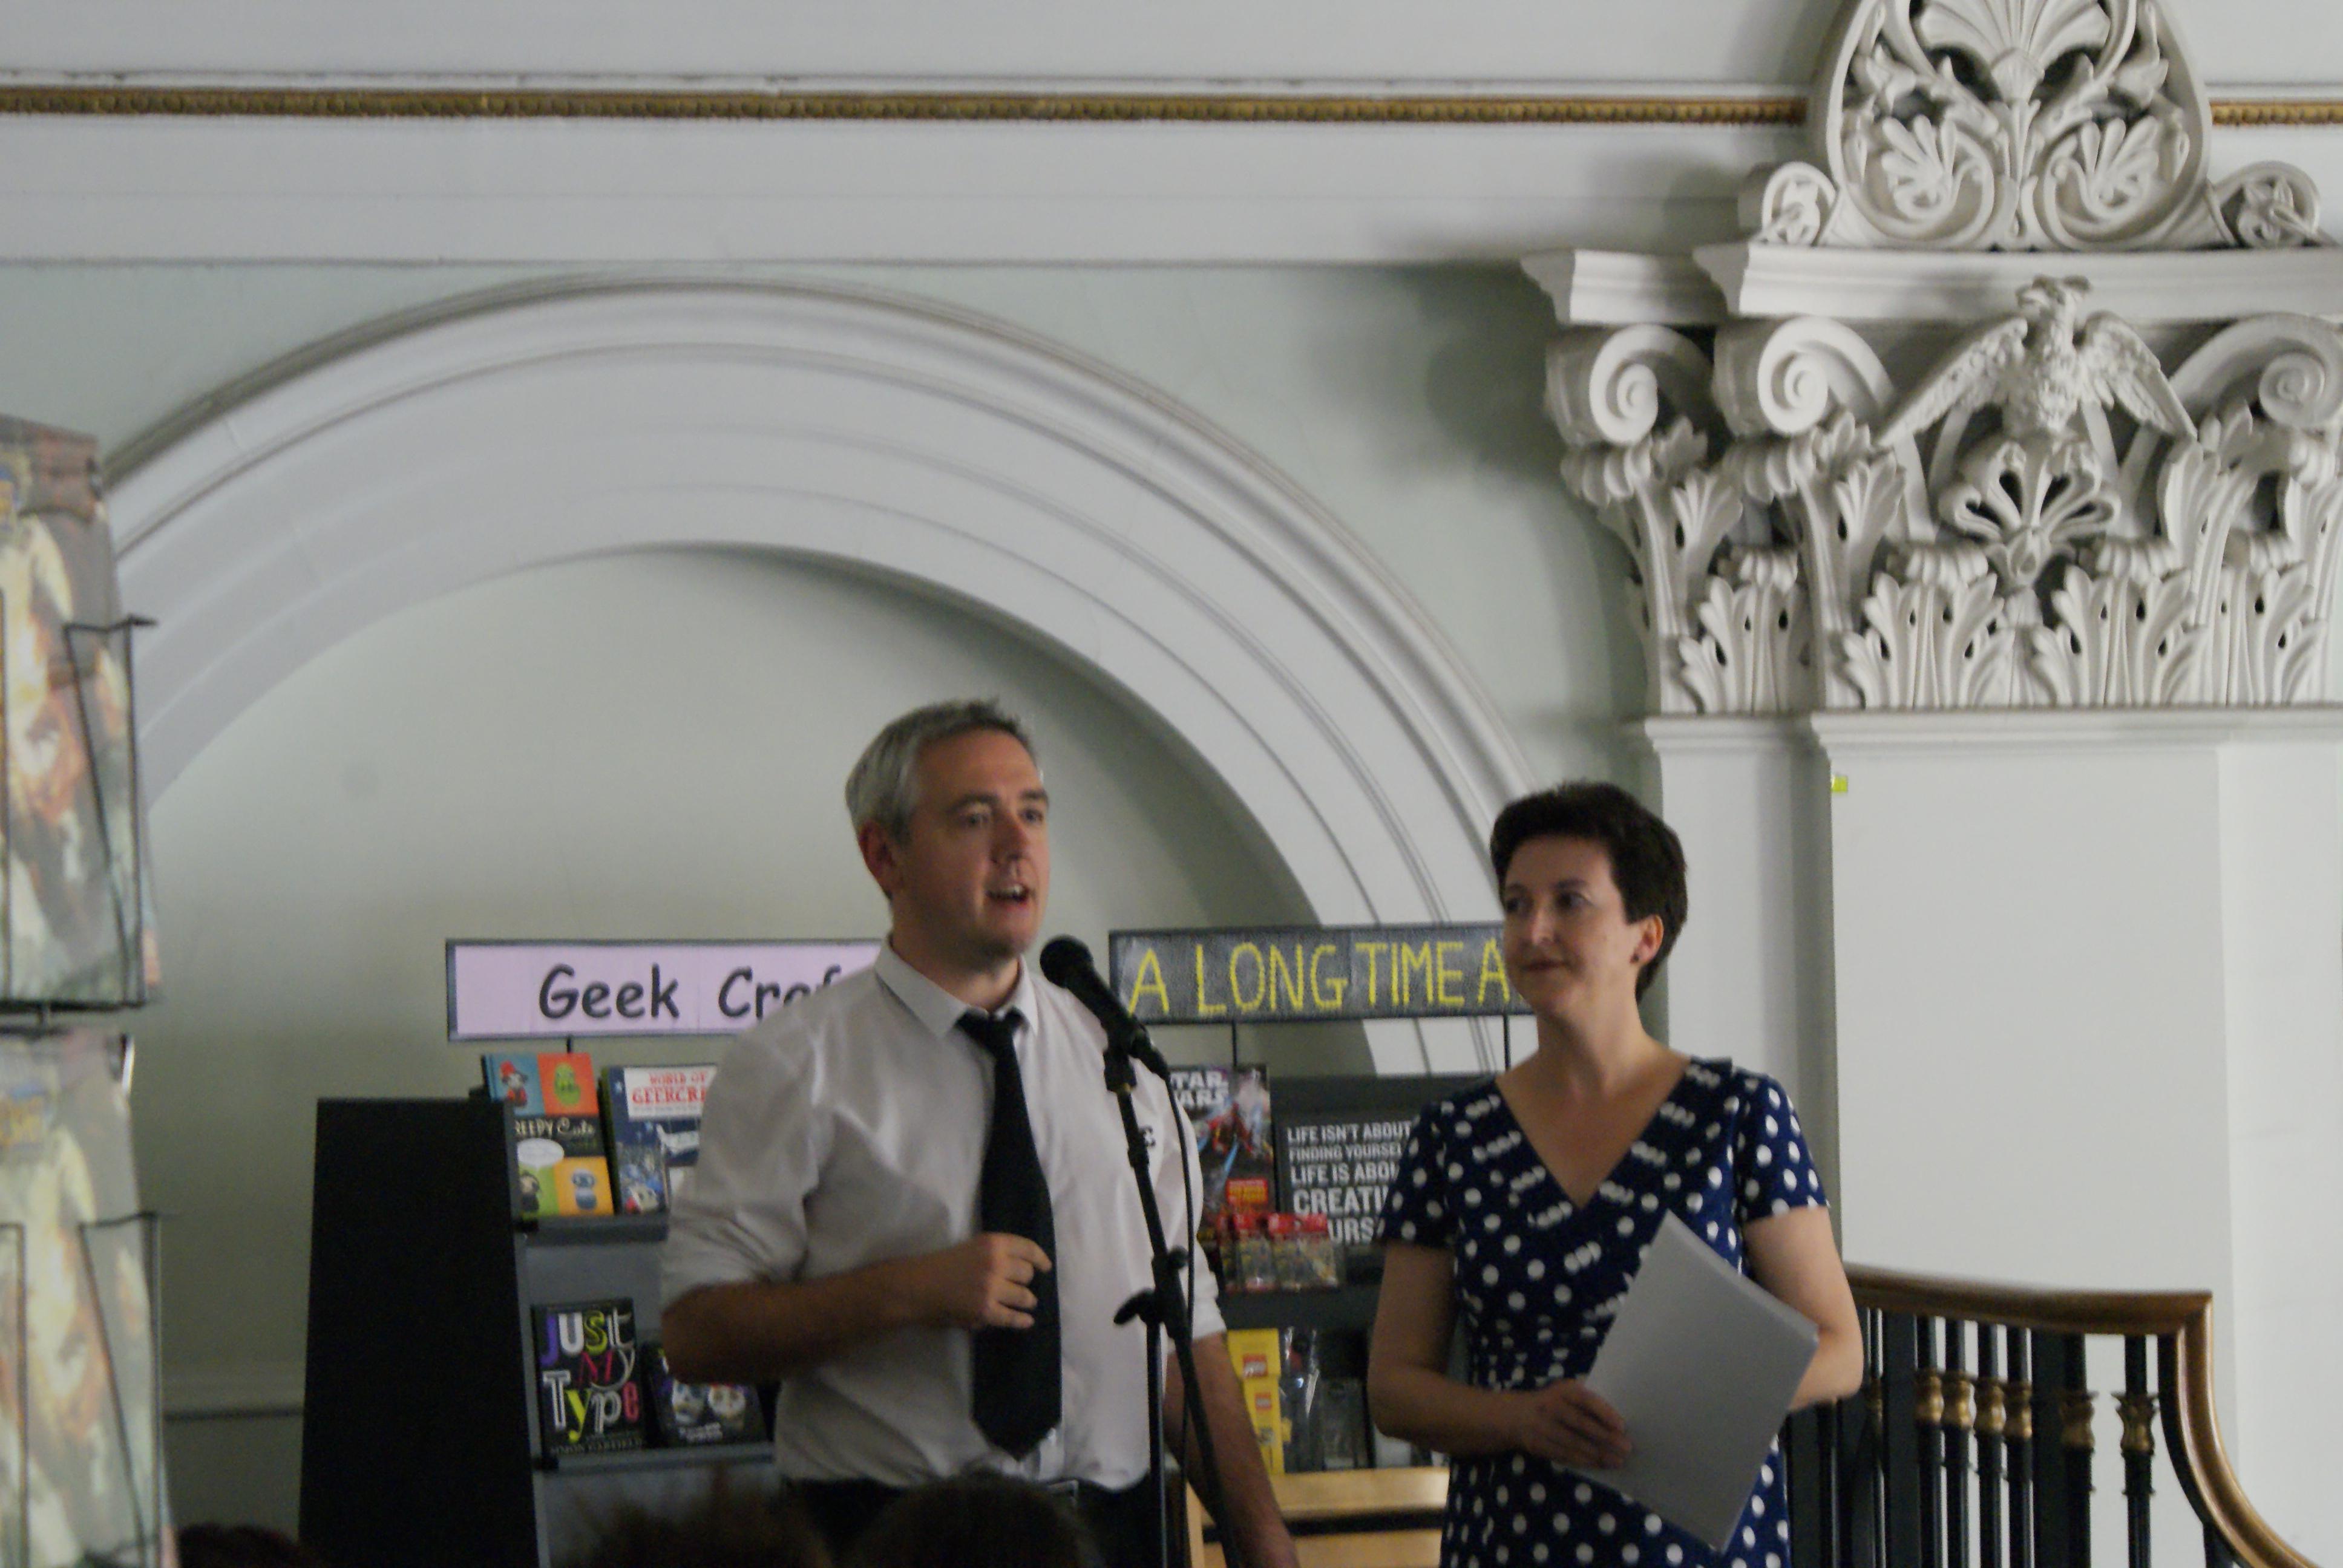 Heide Goody & Iain Grant